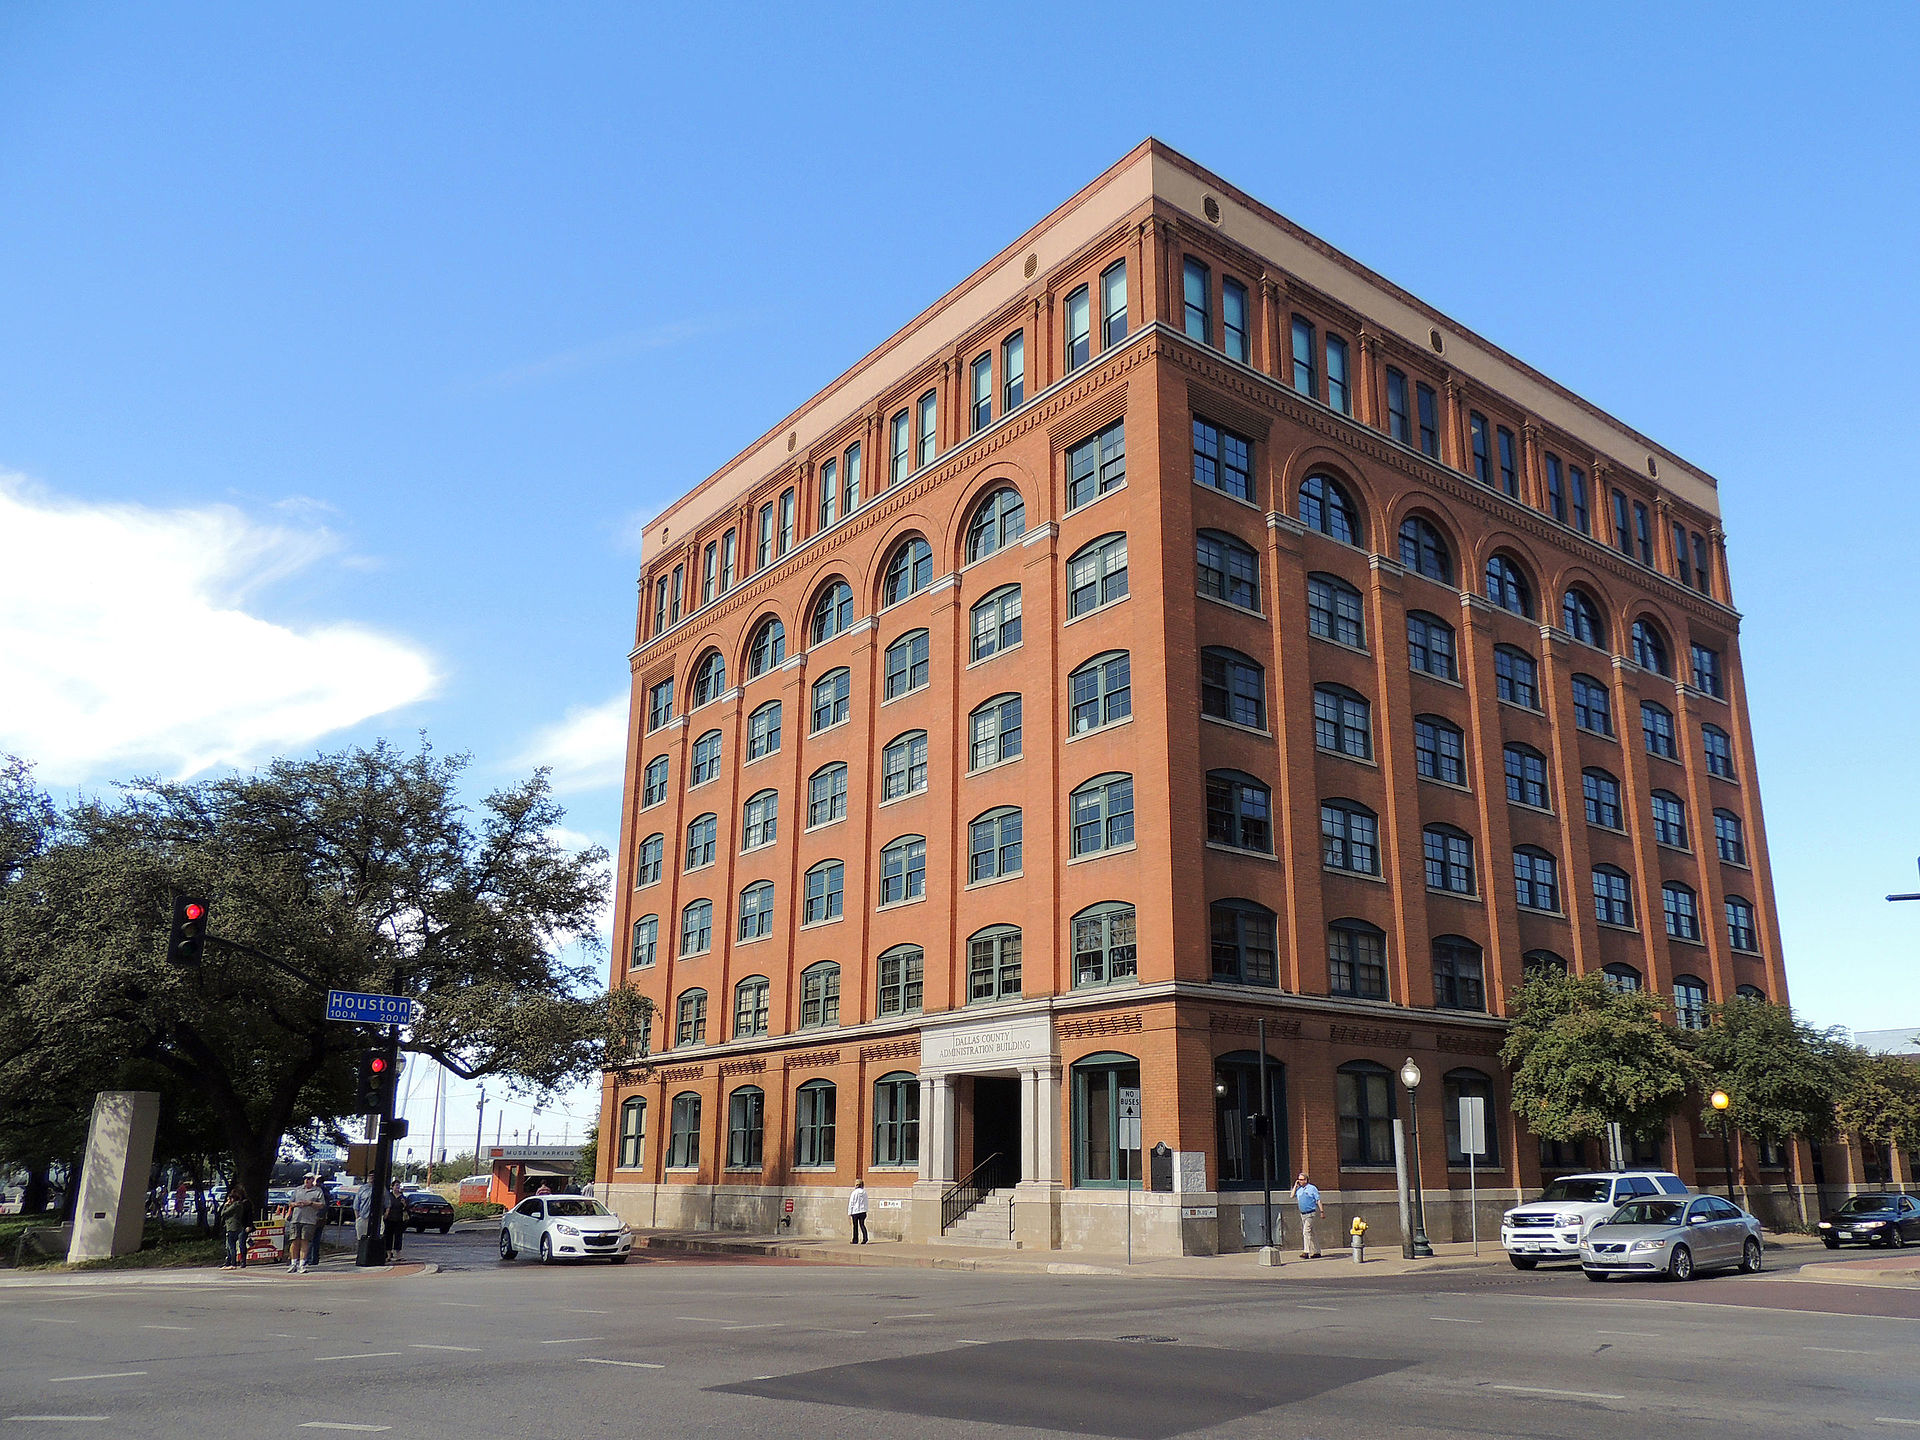 1920px-Dallas_County_Admin_Building.jpg